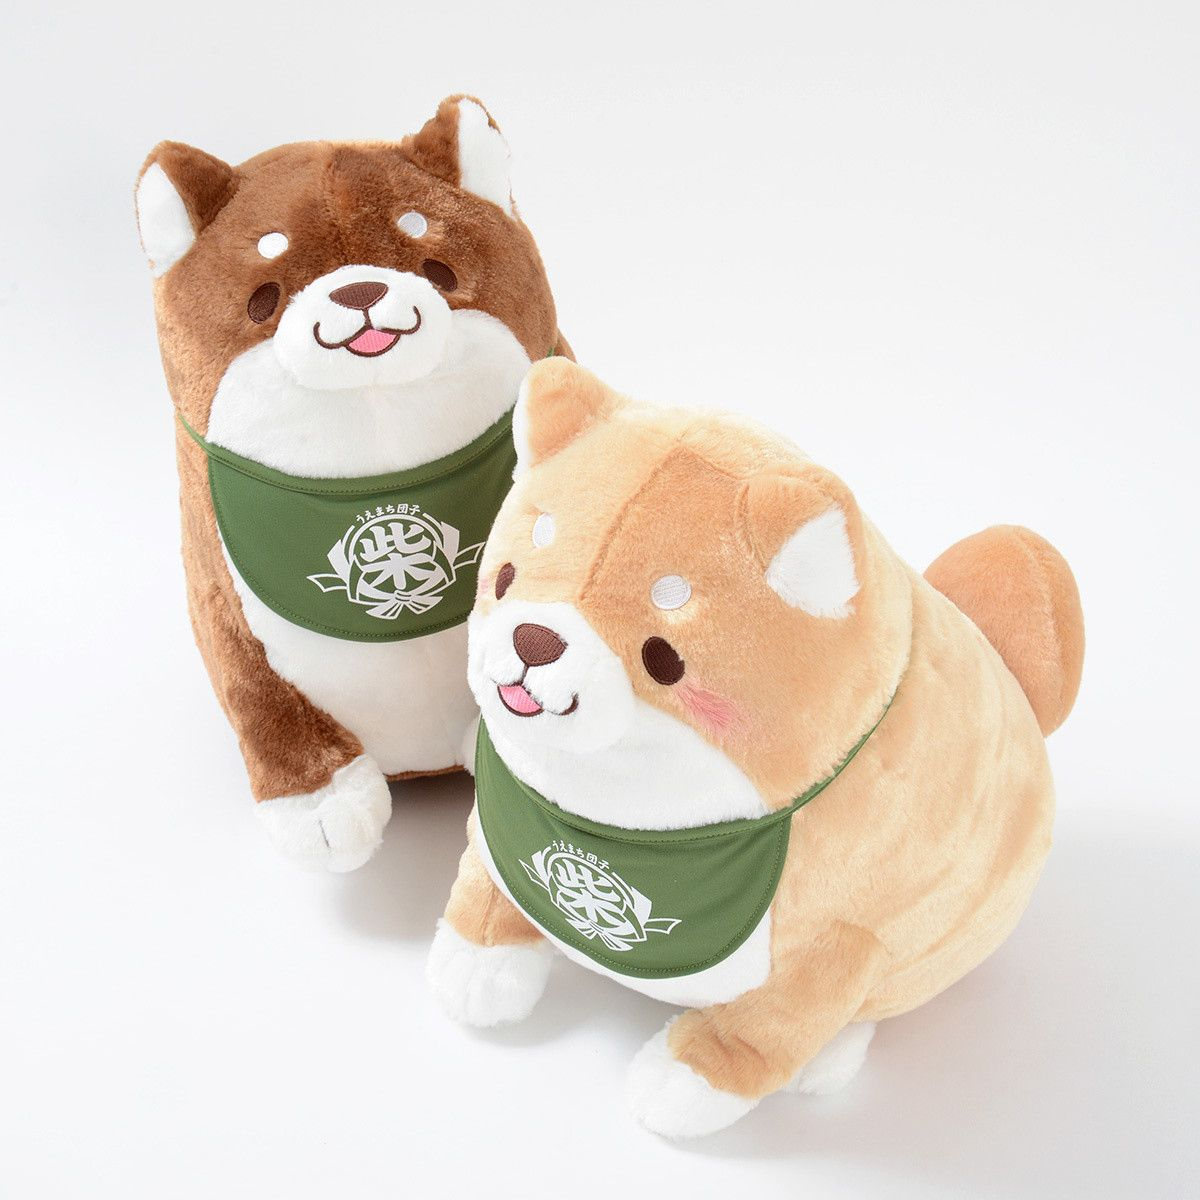 Dog Rubbing Ears On Rug: Chuken Mochi Shiba & Friends Plush Collection (Big